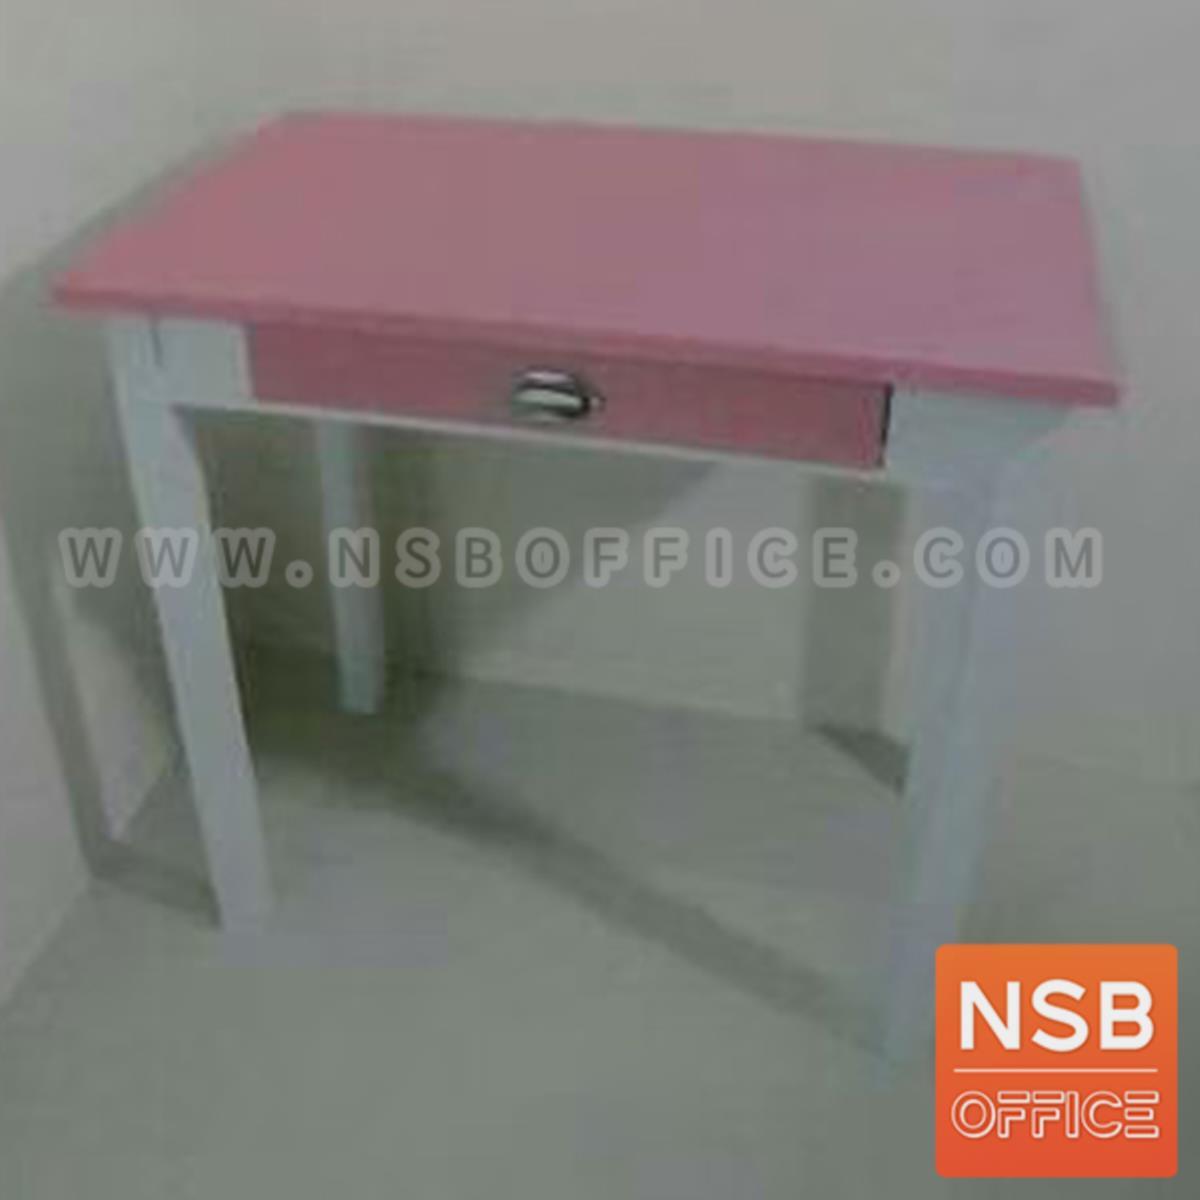 G20A021:โต๊ะไม้ยางพารา 1 ลิ้นชัก รุ่น Dacian (ดาเชียน) ขนาด 80W cm.